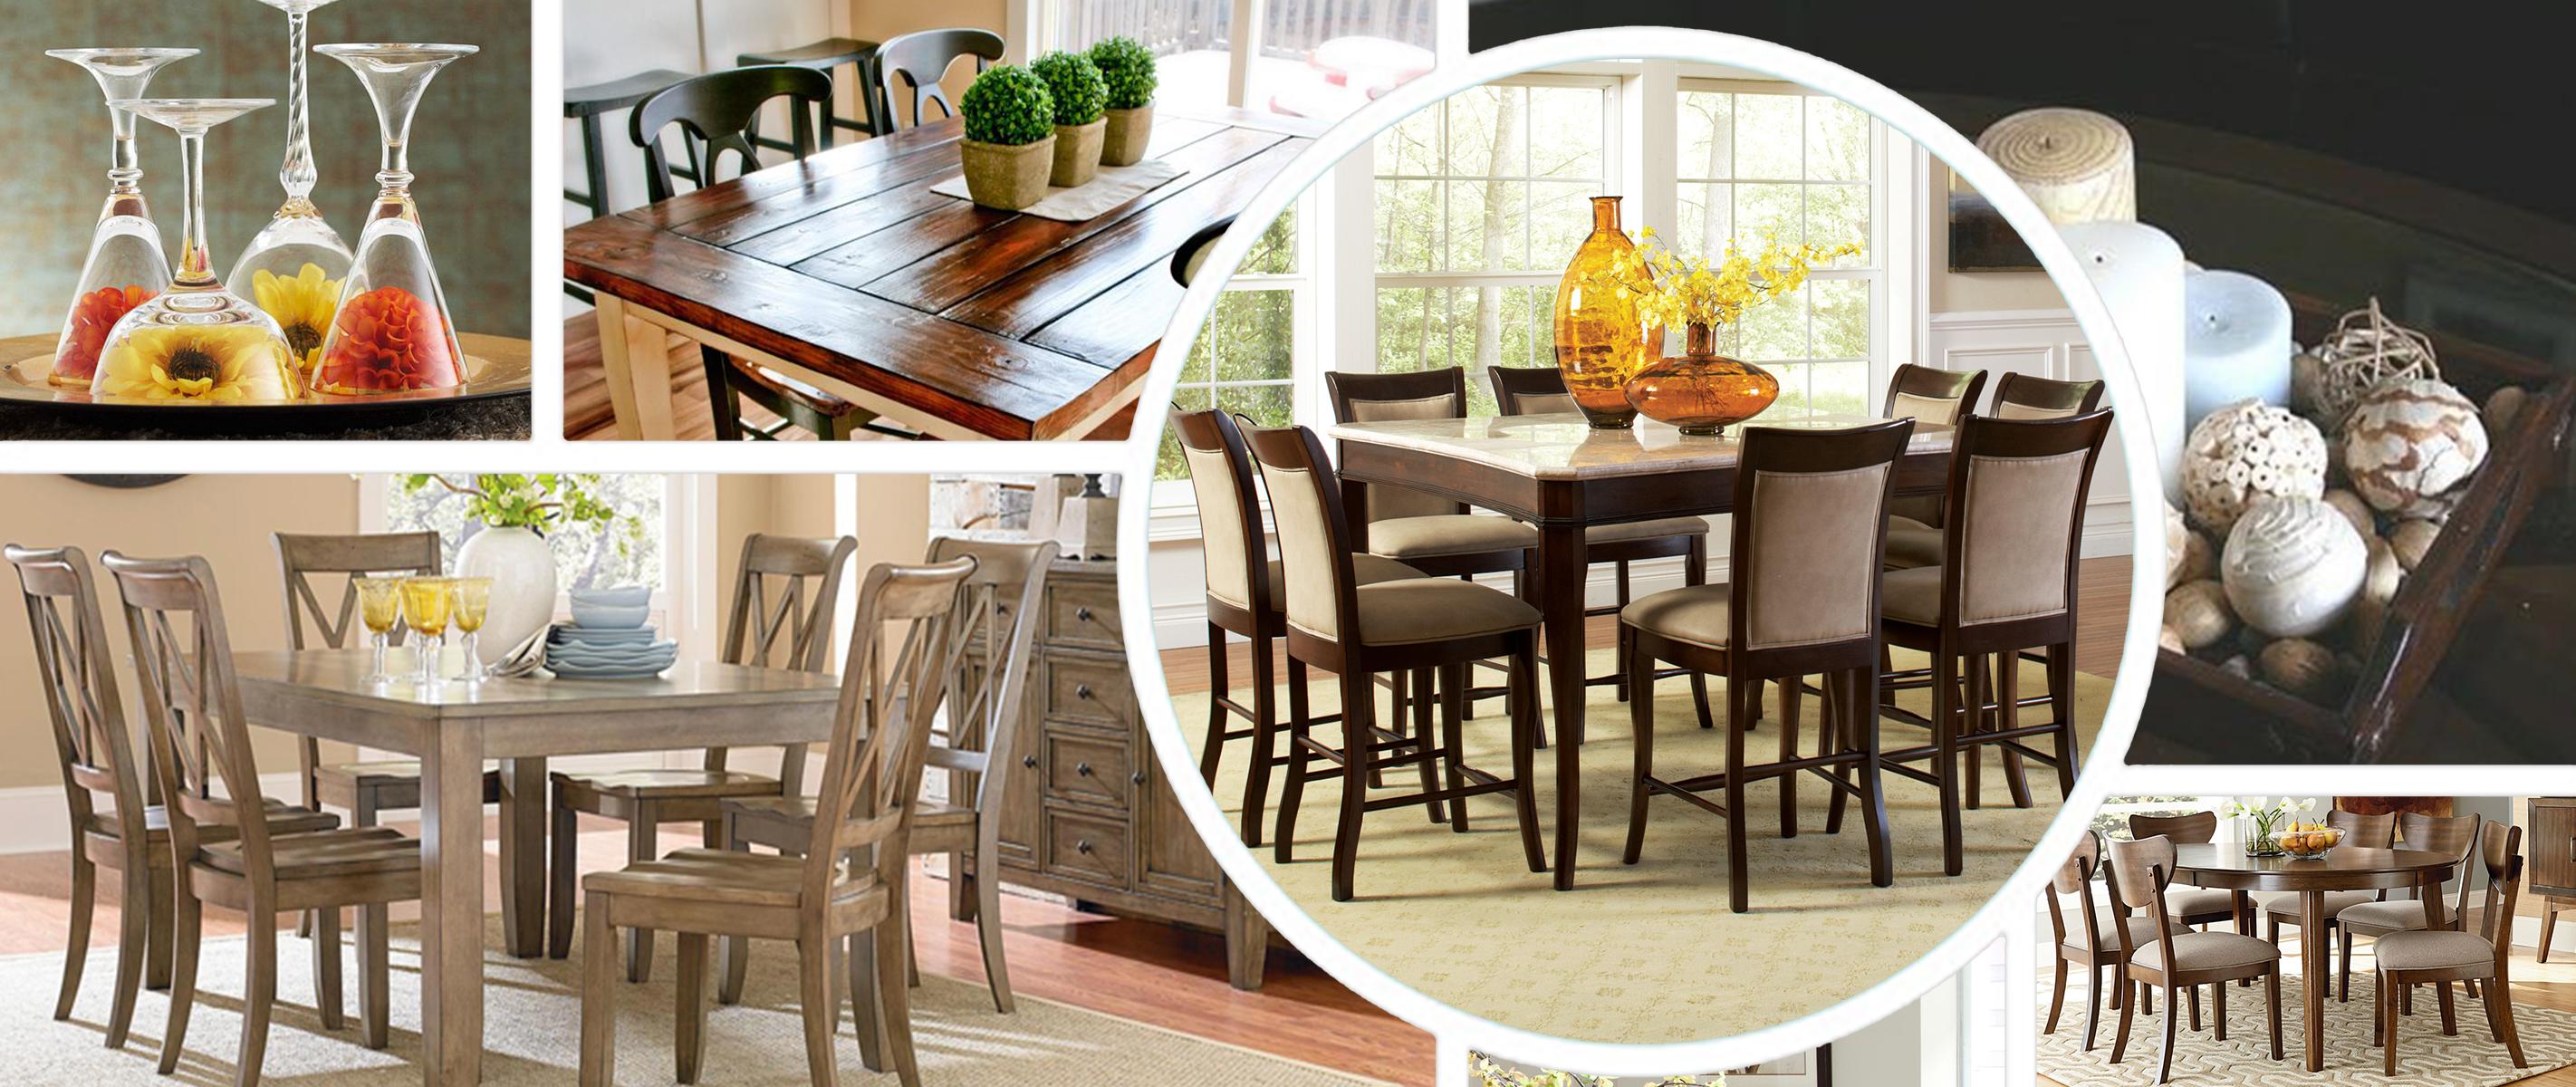 Ideas para centros de mesa del comedor berrios te da m s - Centros de mesa de comedor ...